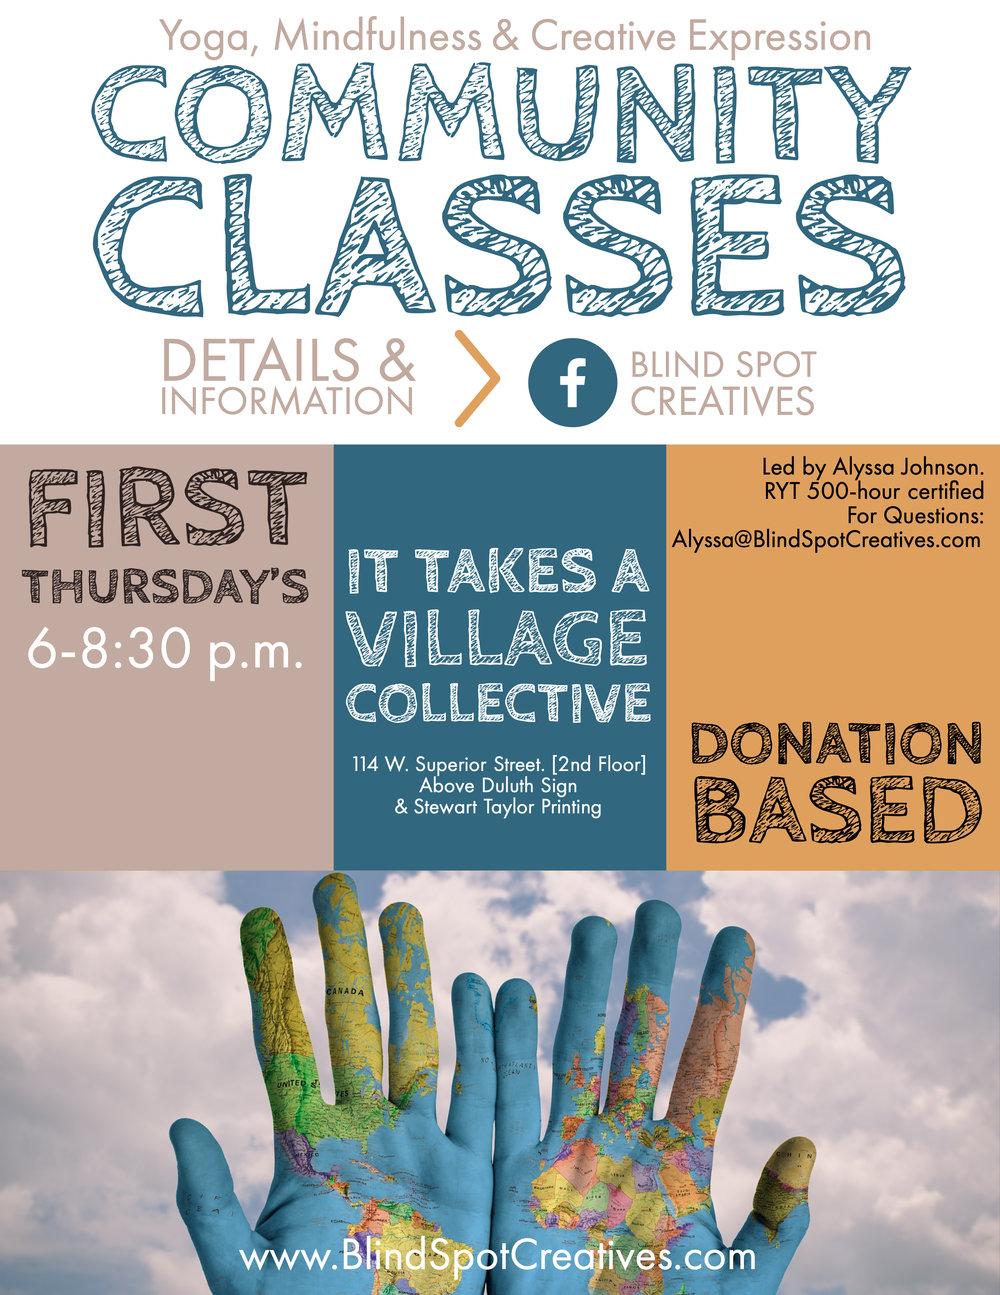 First Thursday Yoga, Mindfulness & Yoga Class - Blind Spot Wellness - Duluth, Minnesota - Alyssa Johnson